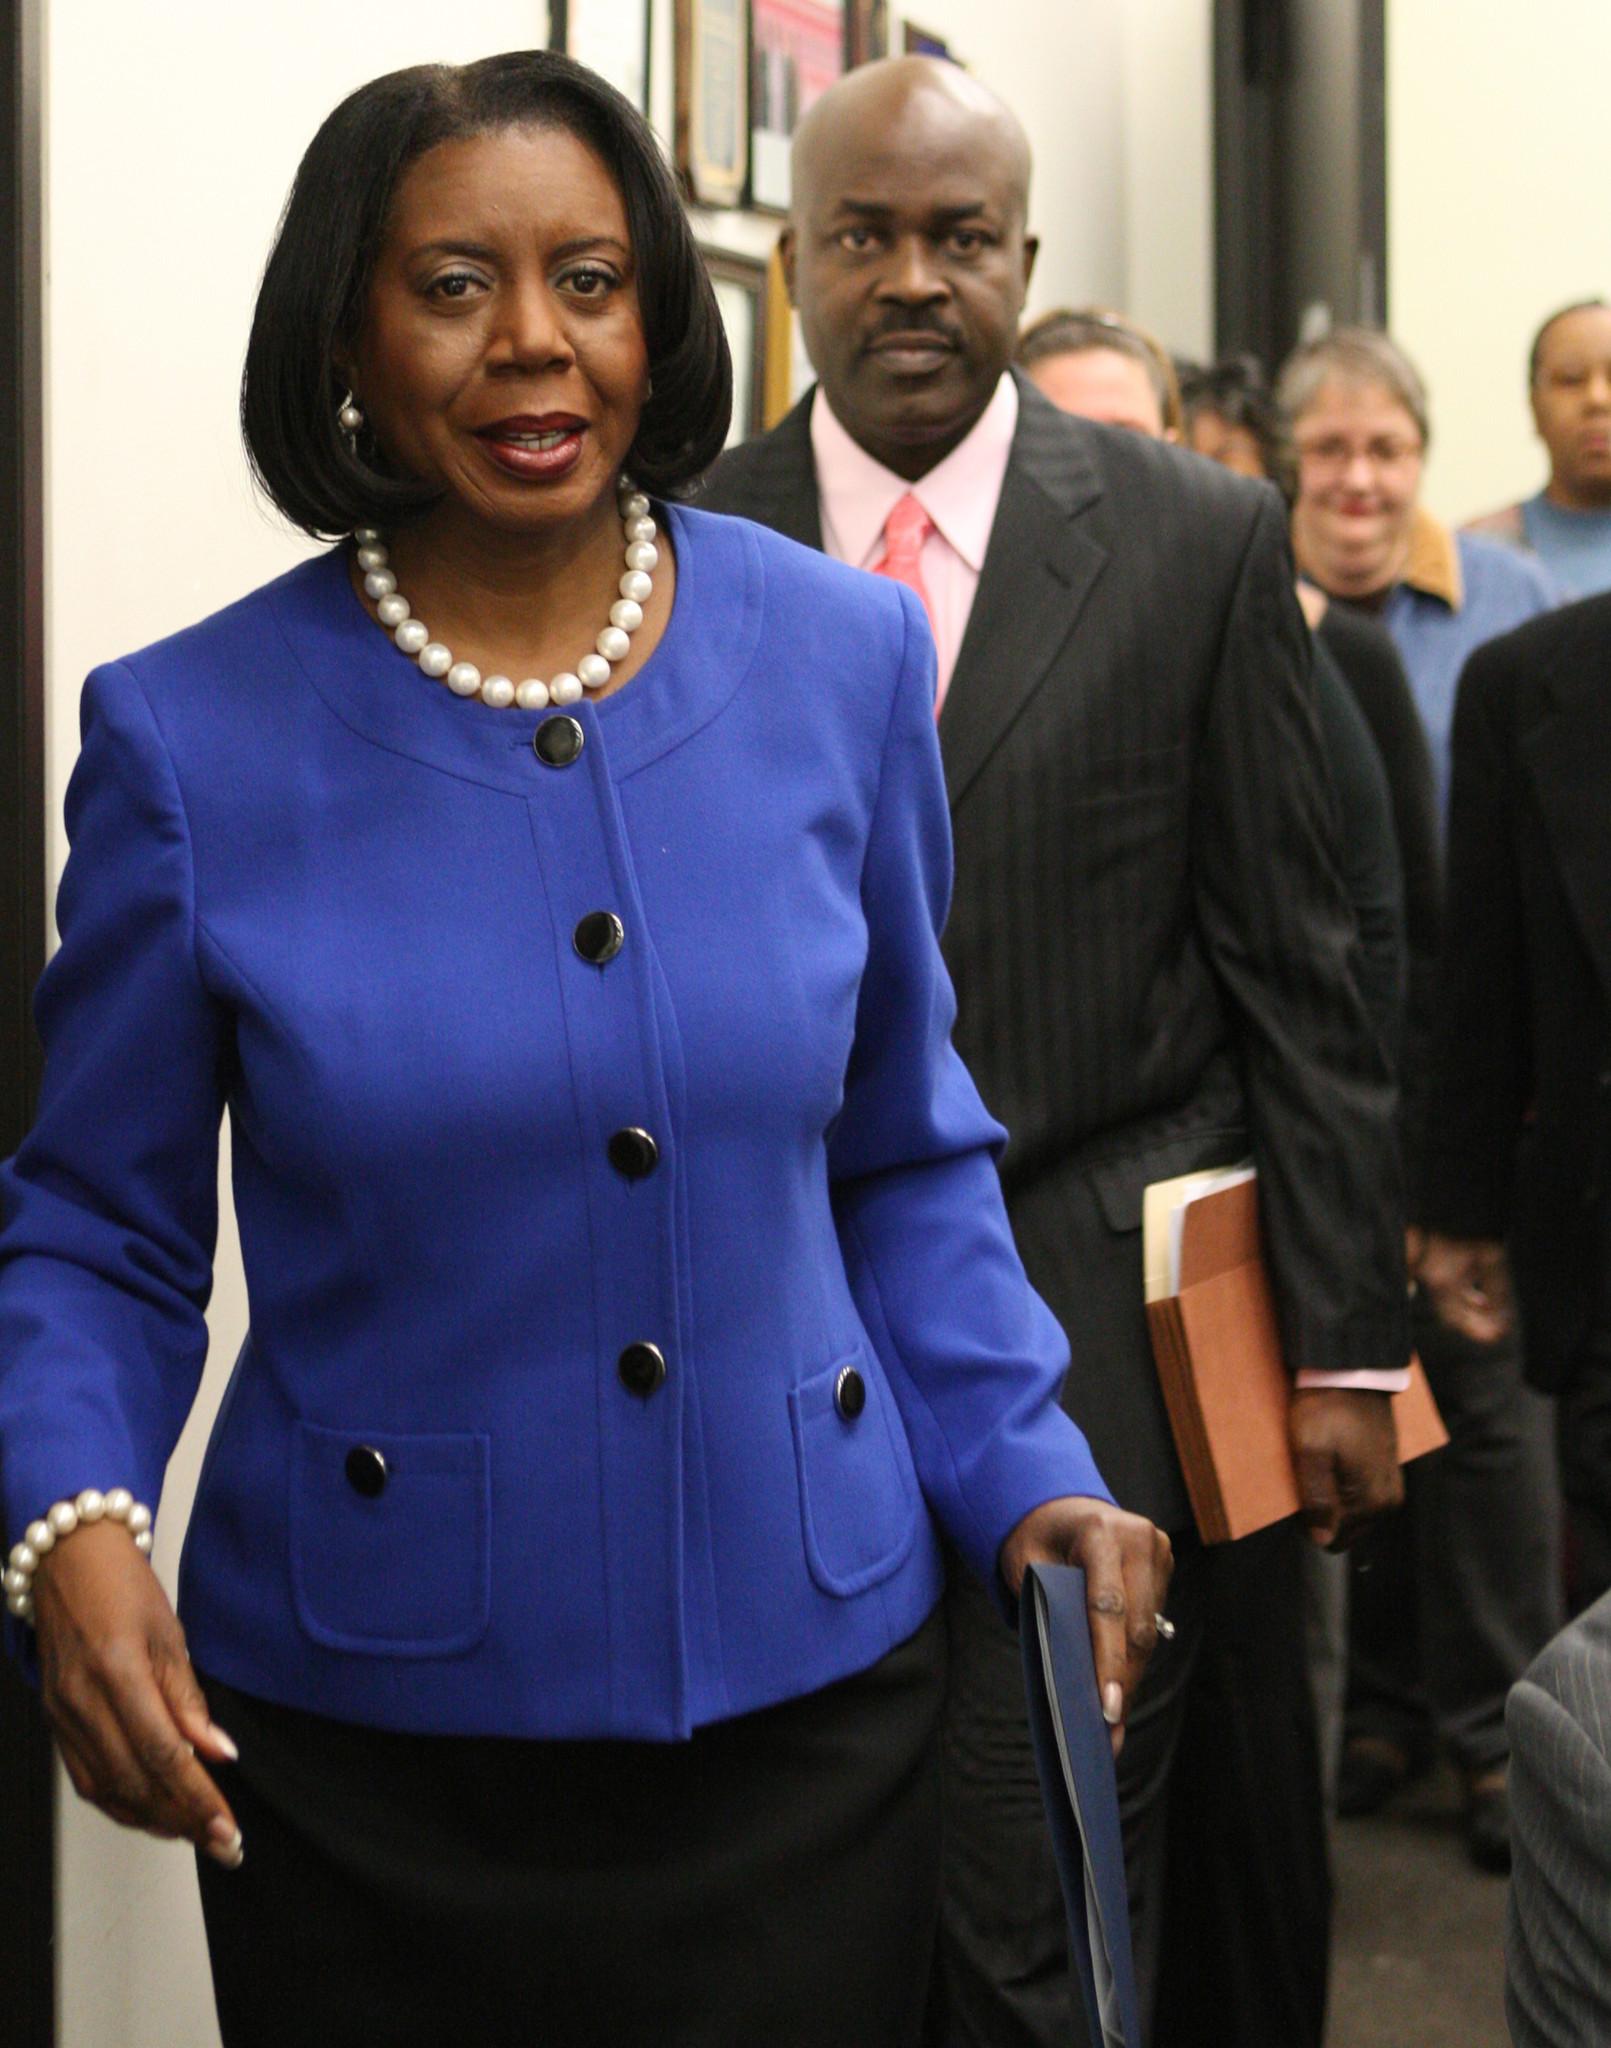 Regulators File Complaint Against Brown S Husband